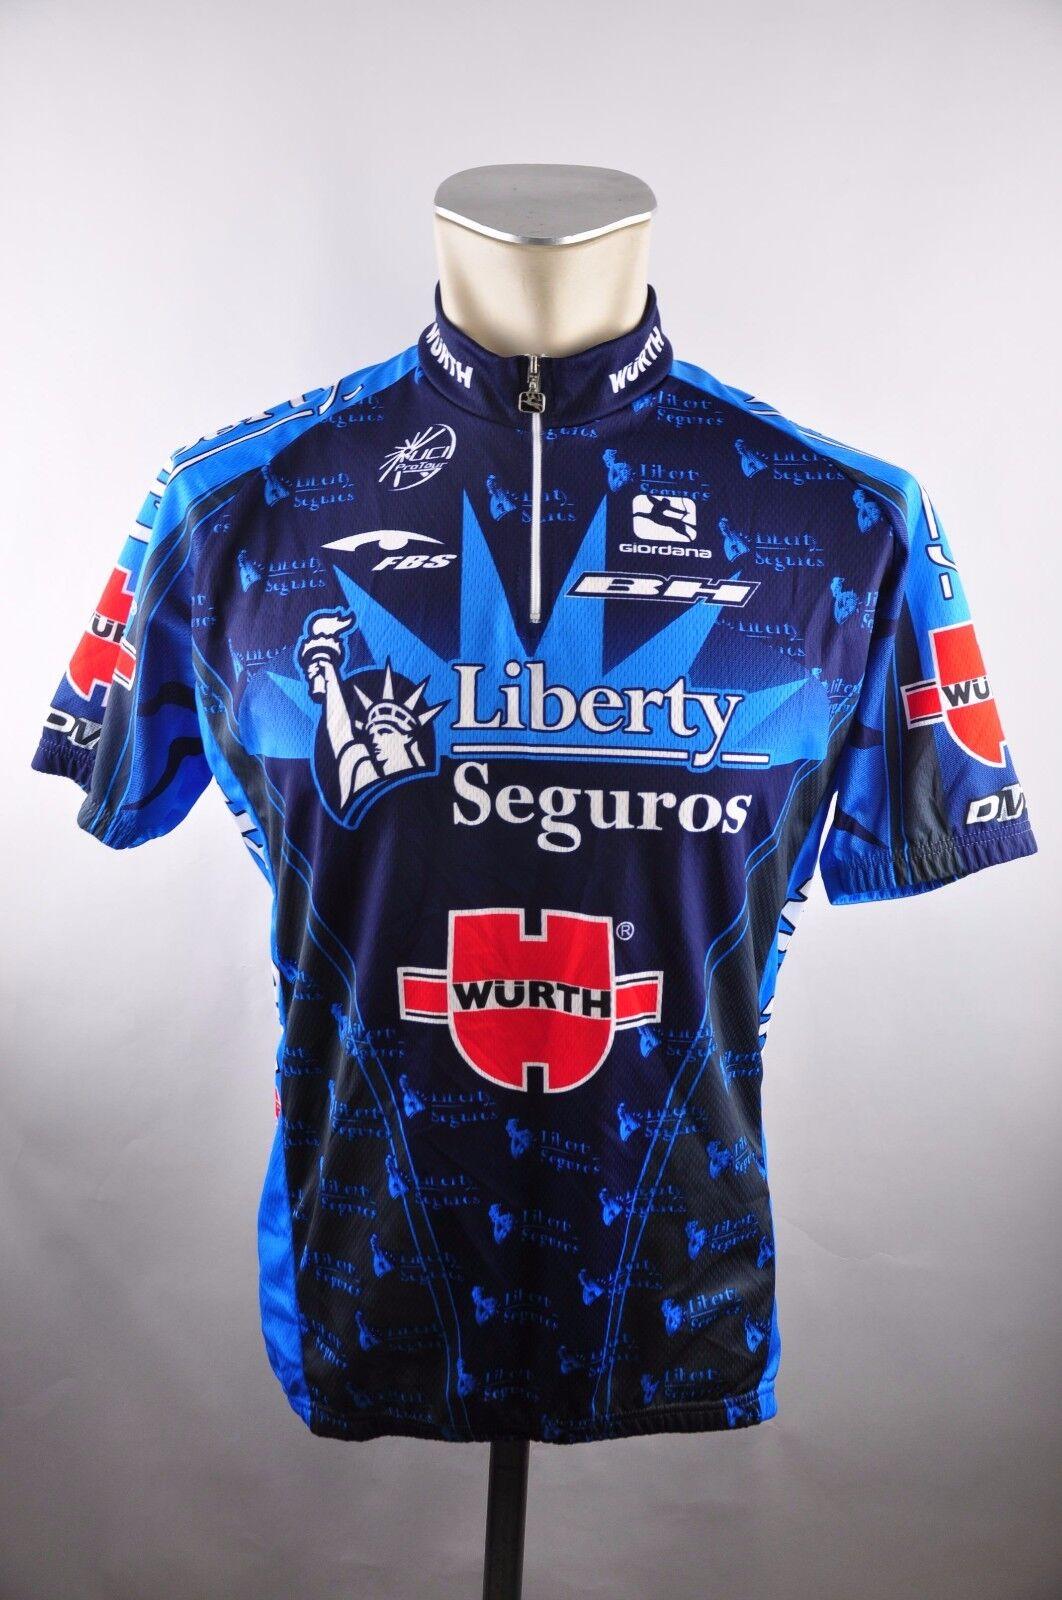 Giordana Liberty Seguros UCI Radtrikot cycling jersey Trikot Gr. XL 58cm BR1